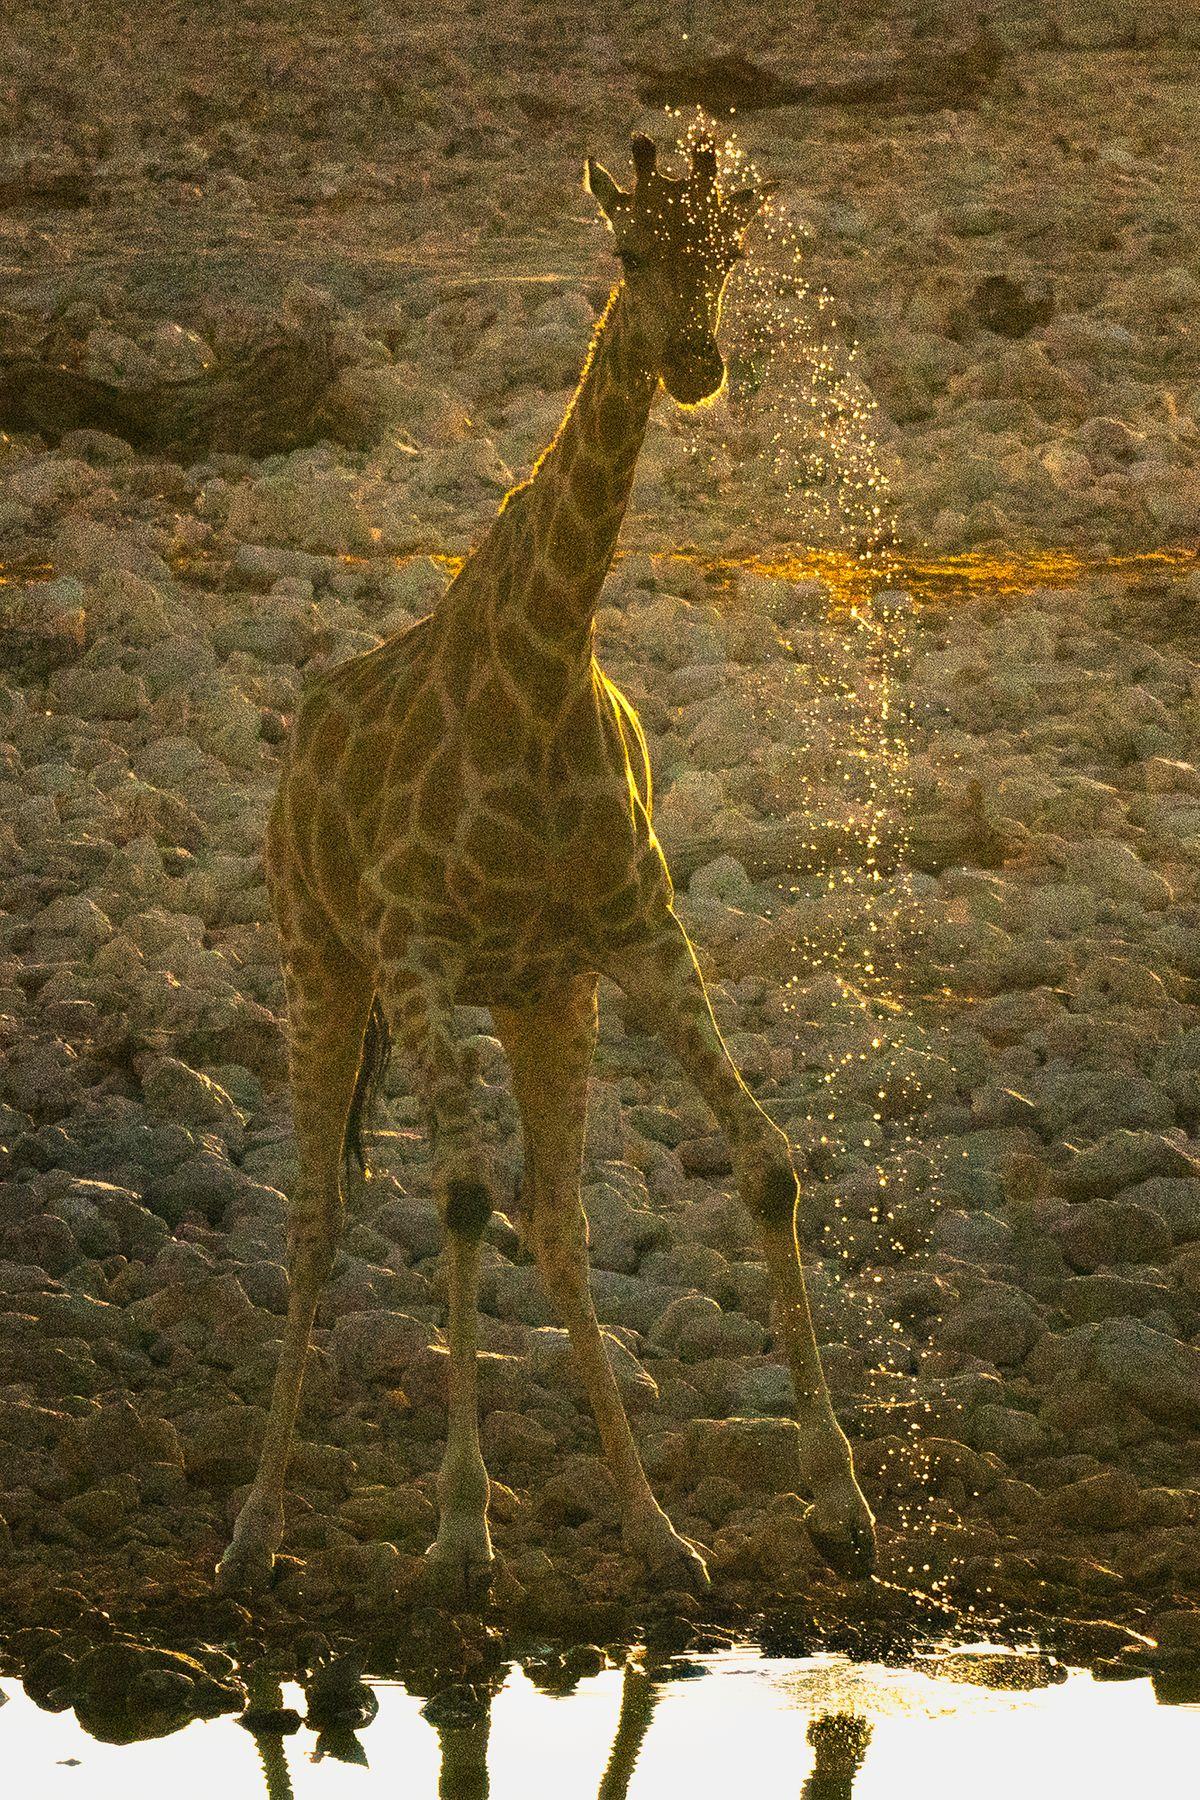 Giraffe Getting Wet